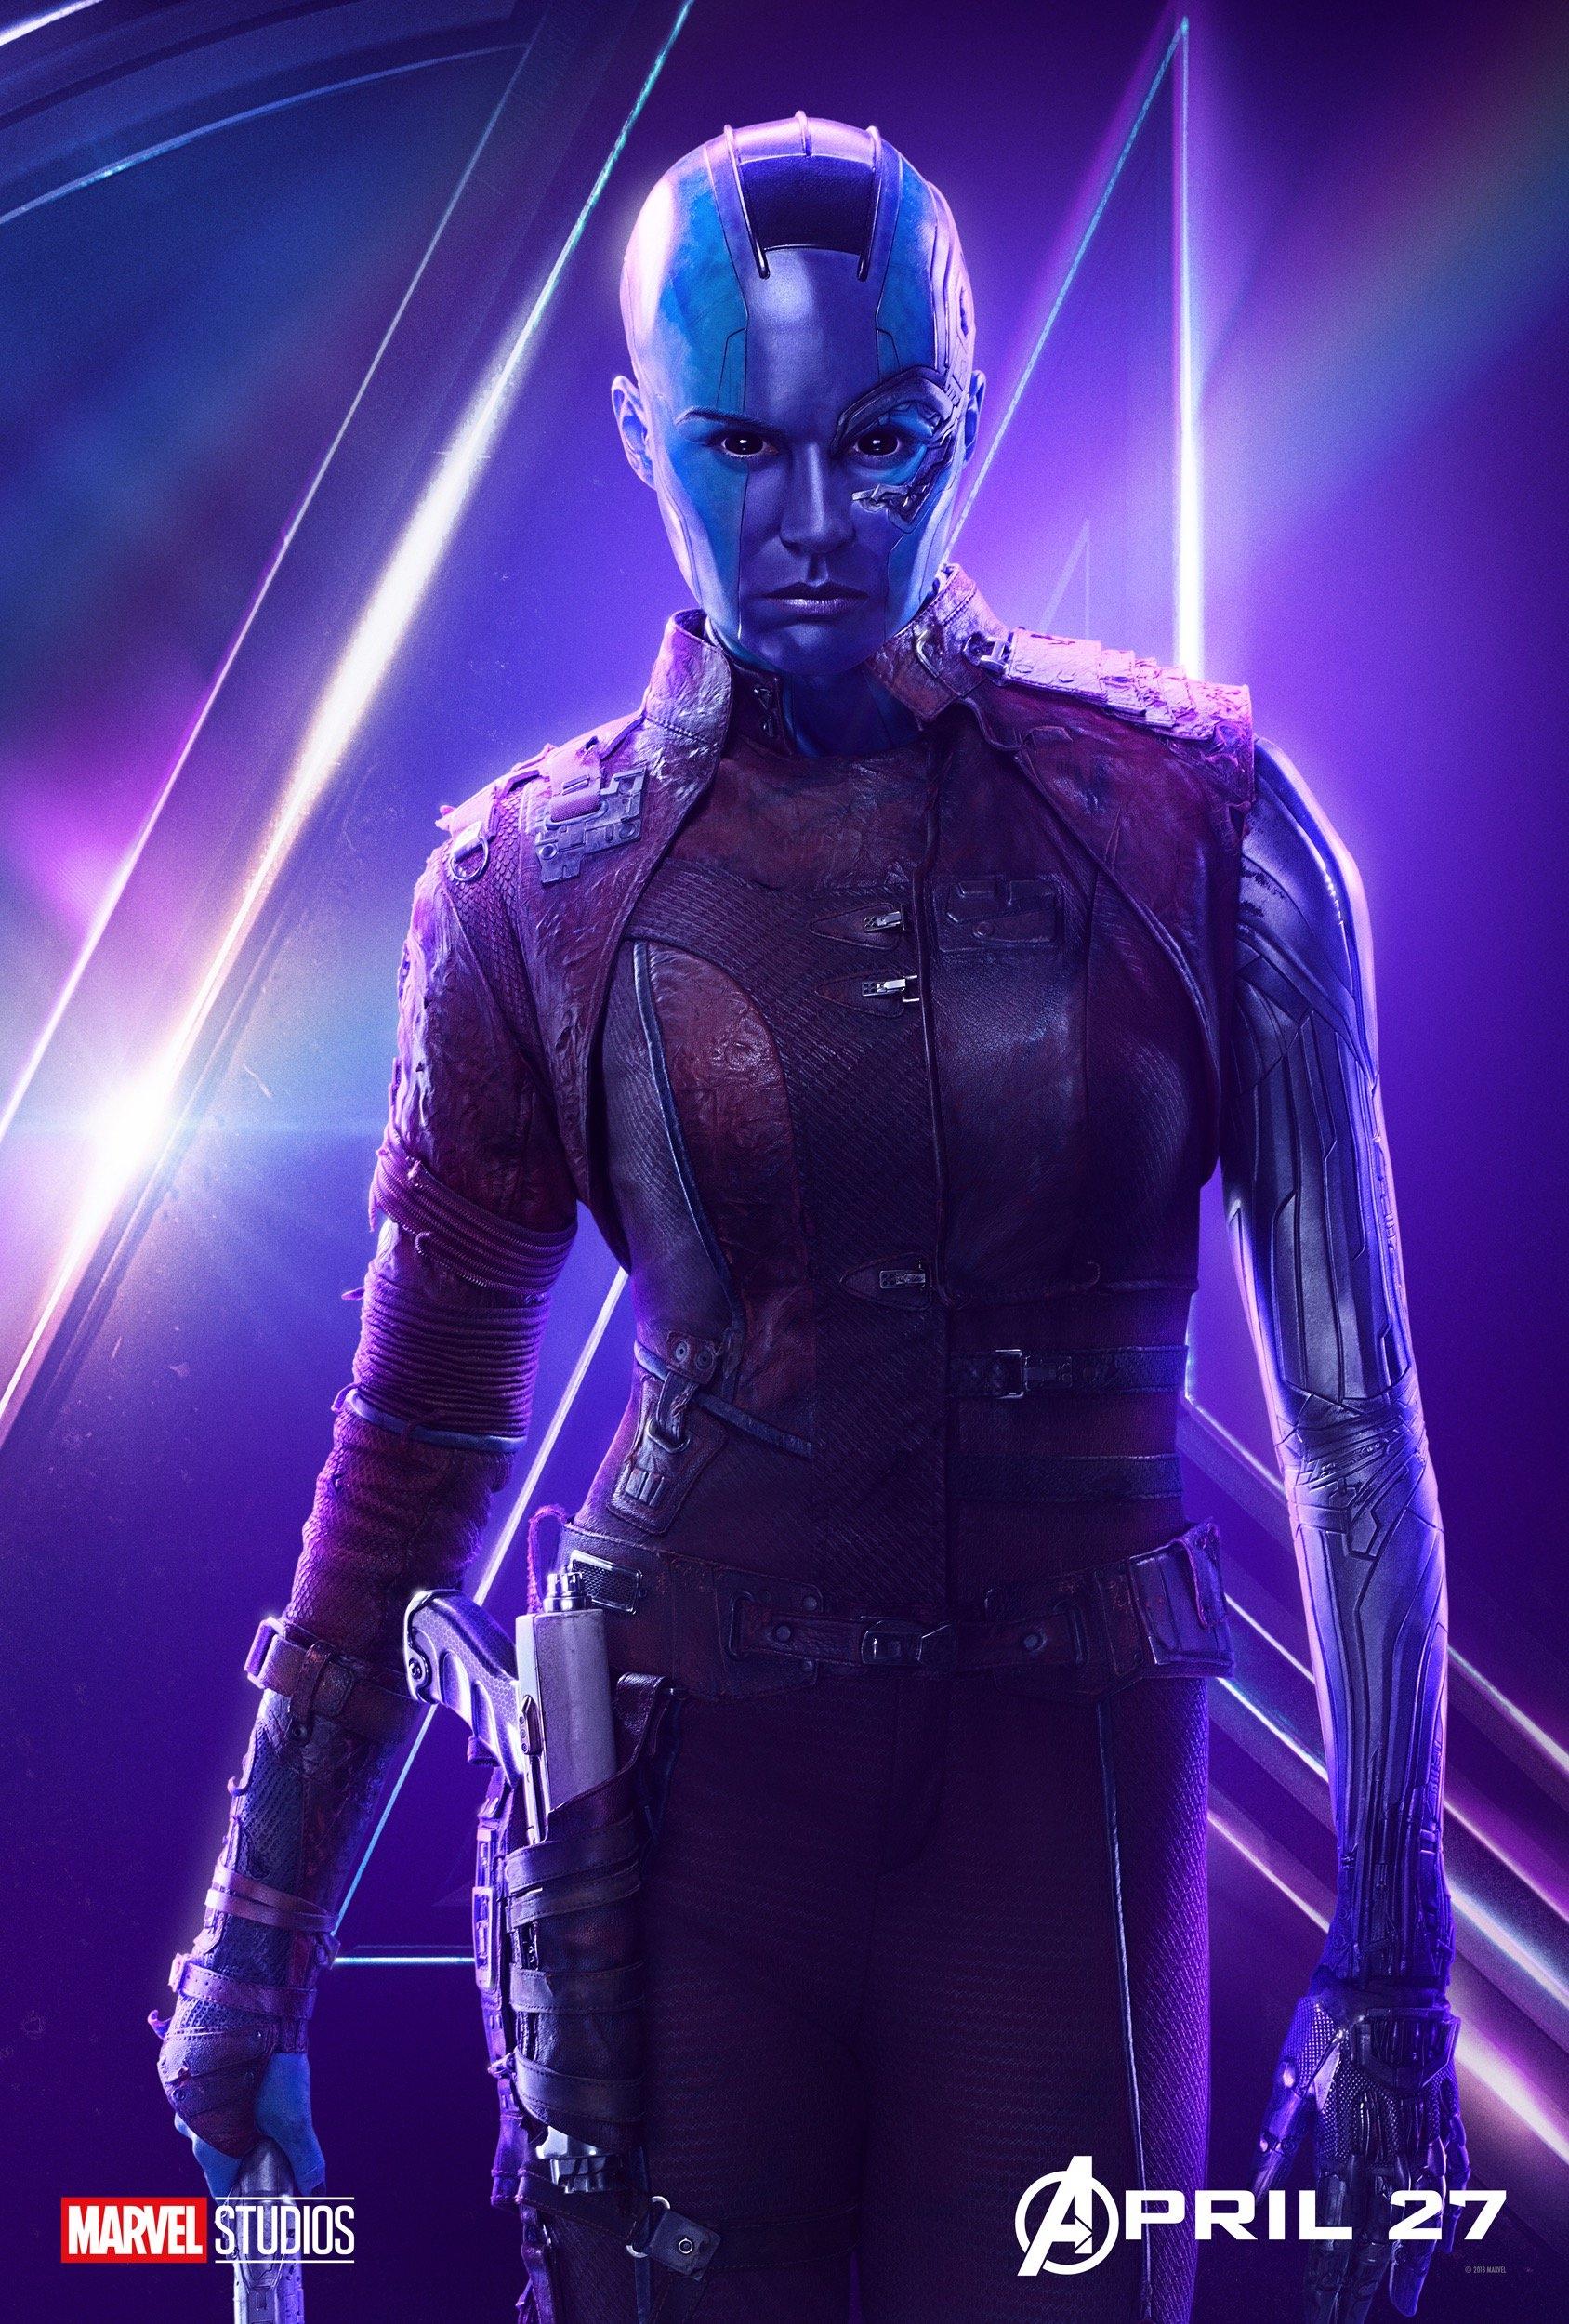 Nebula marvel movies fandom powered by wikia - Images avengers ...